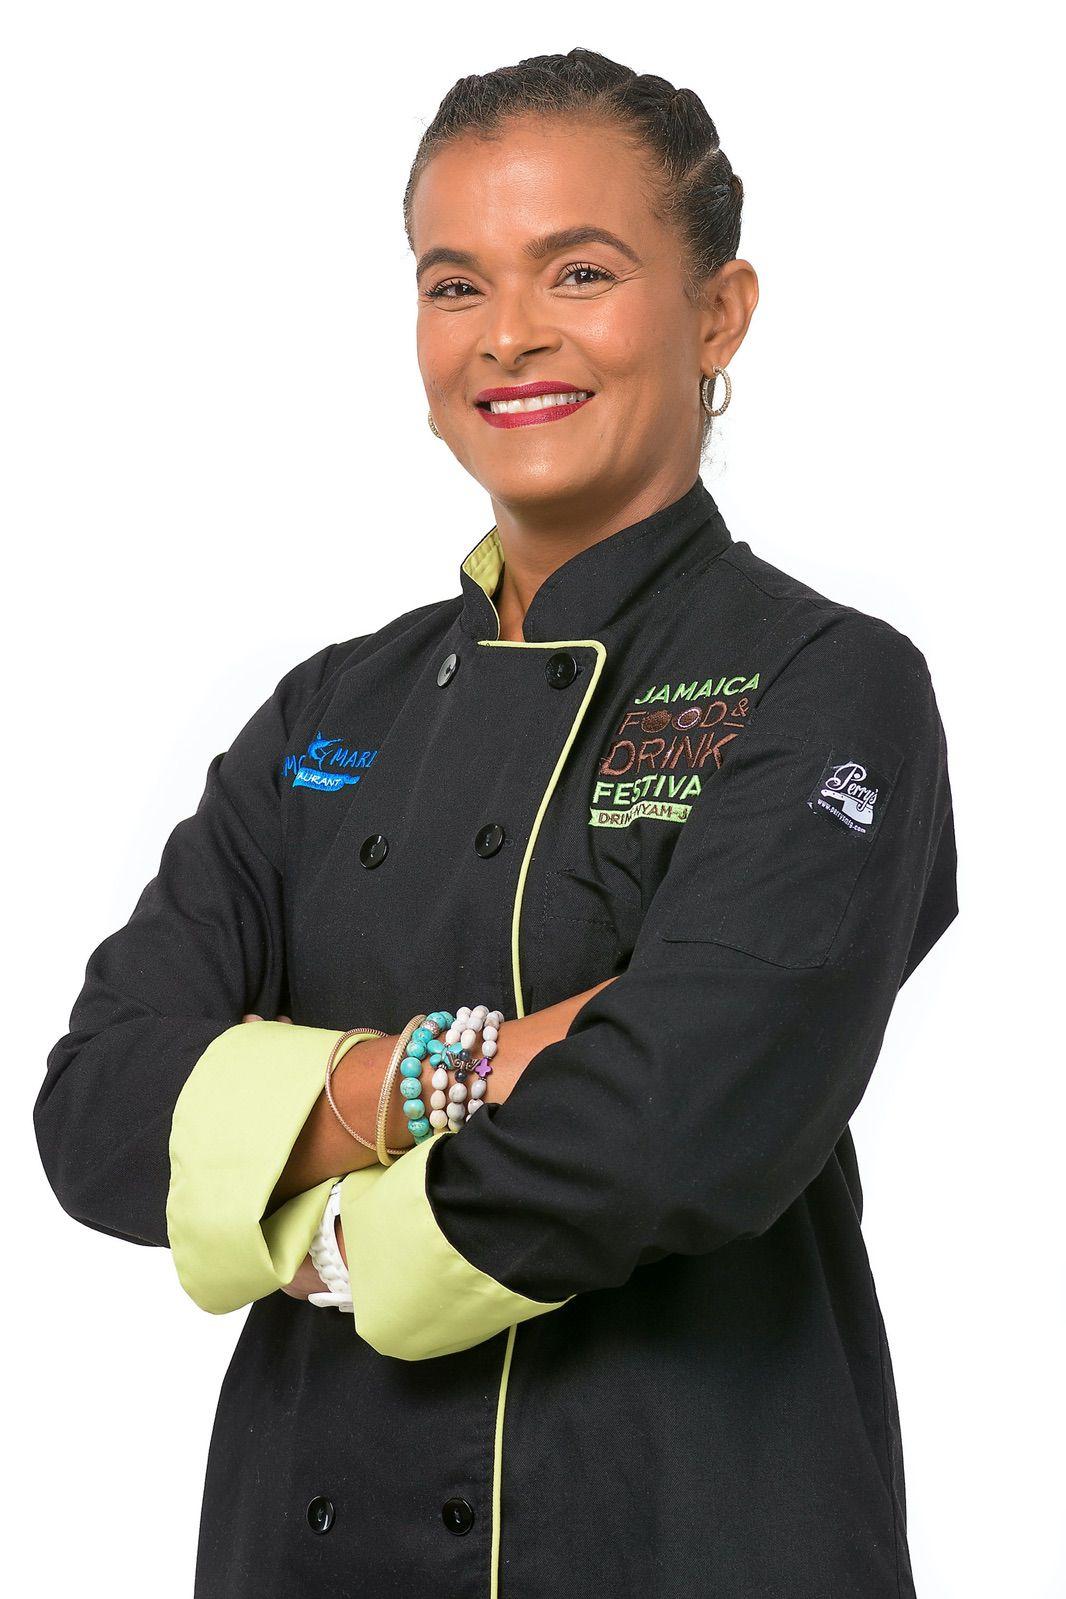 Jamaica Food & Drink Festival Chef Portraits Shoot 2 Edits-6550.jpg